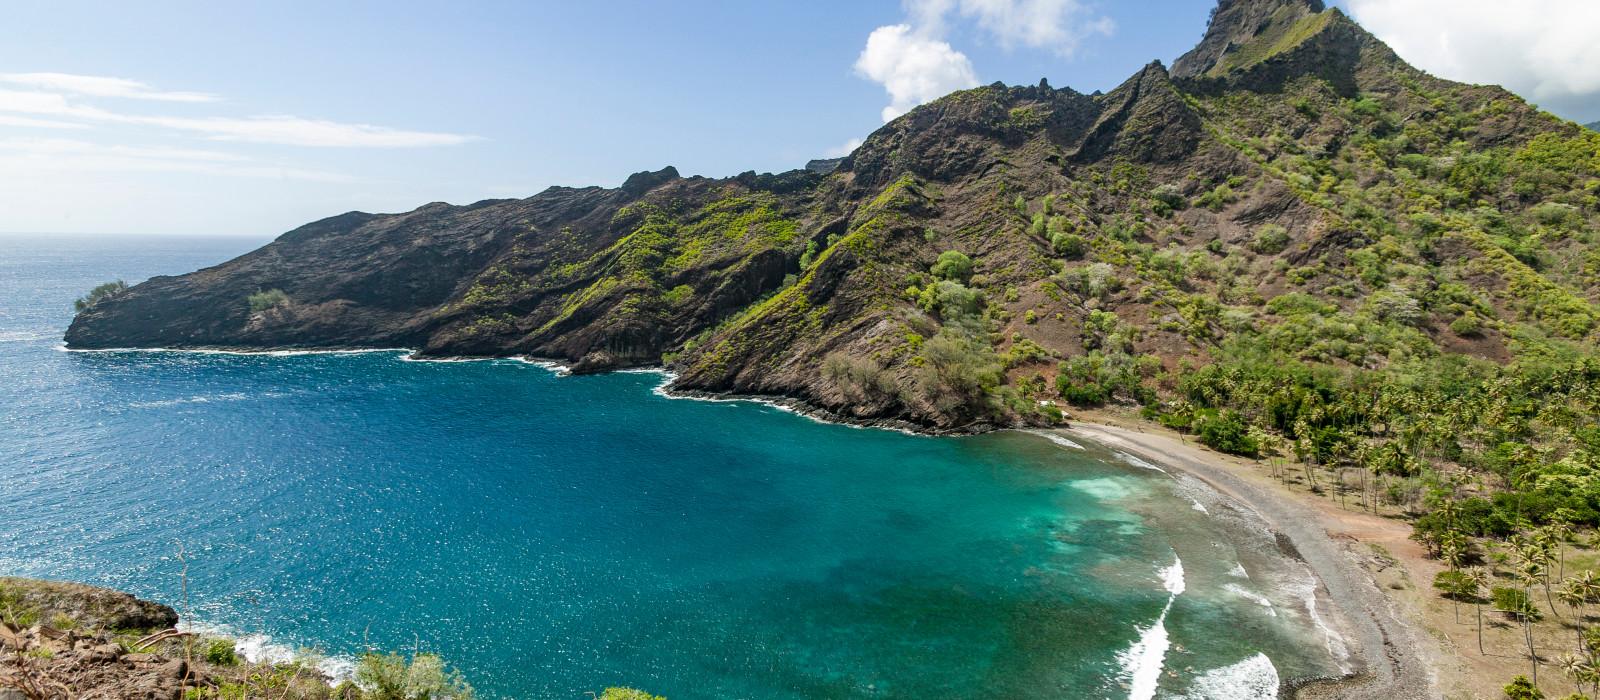 Destination Hiva Oa French Polynesia